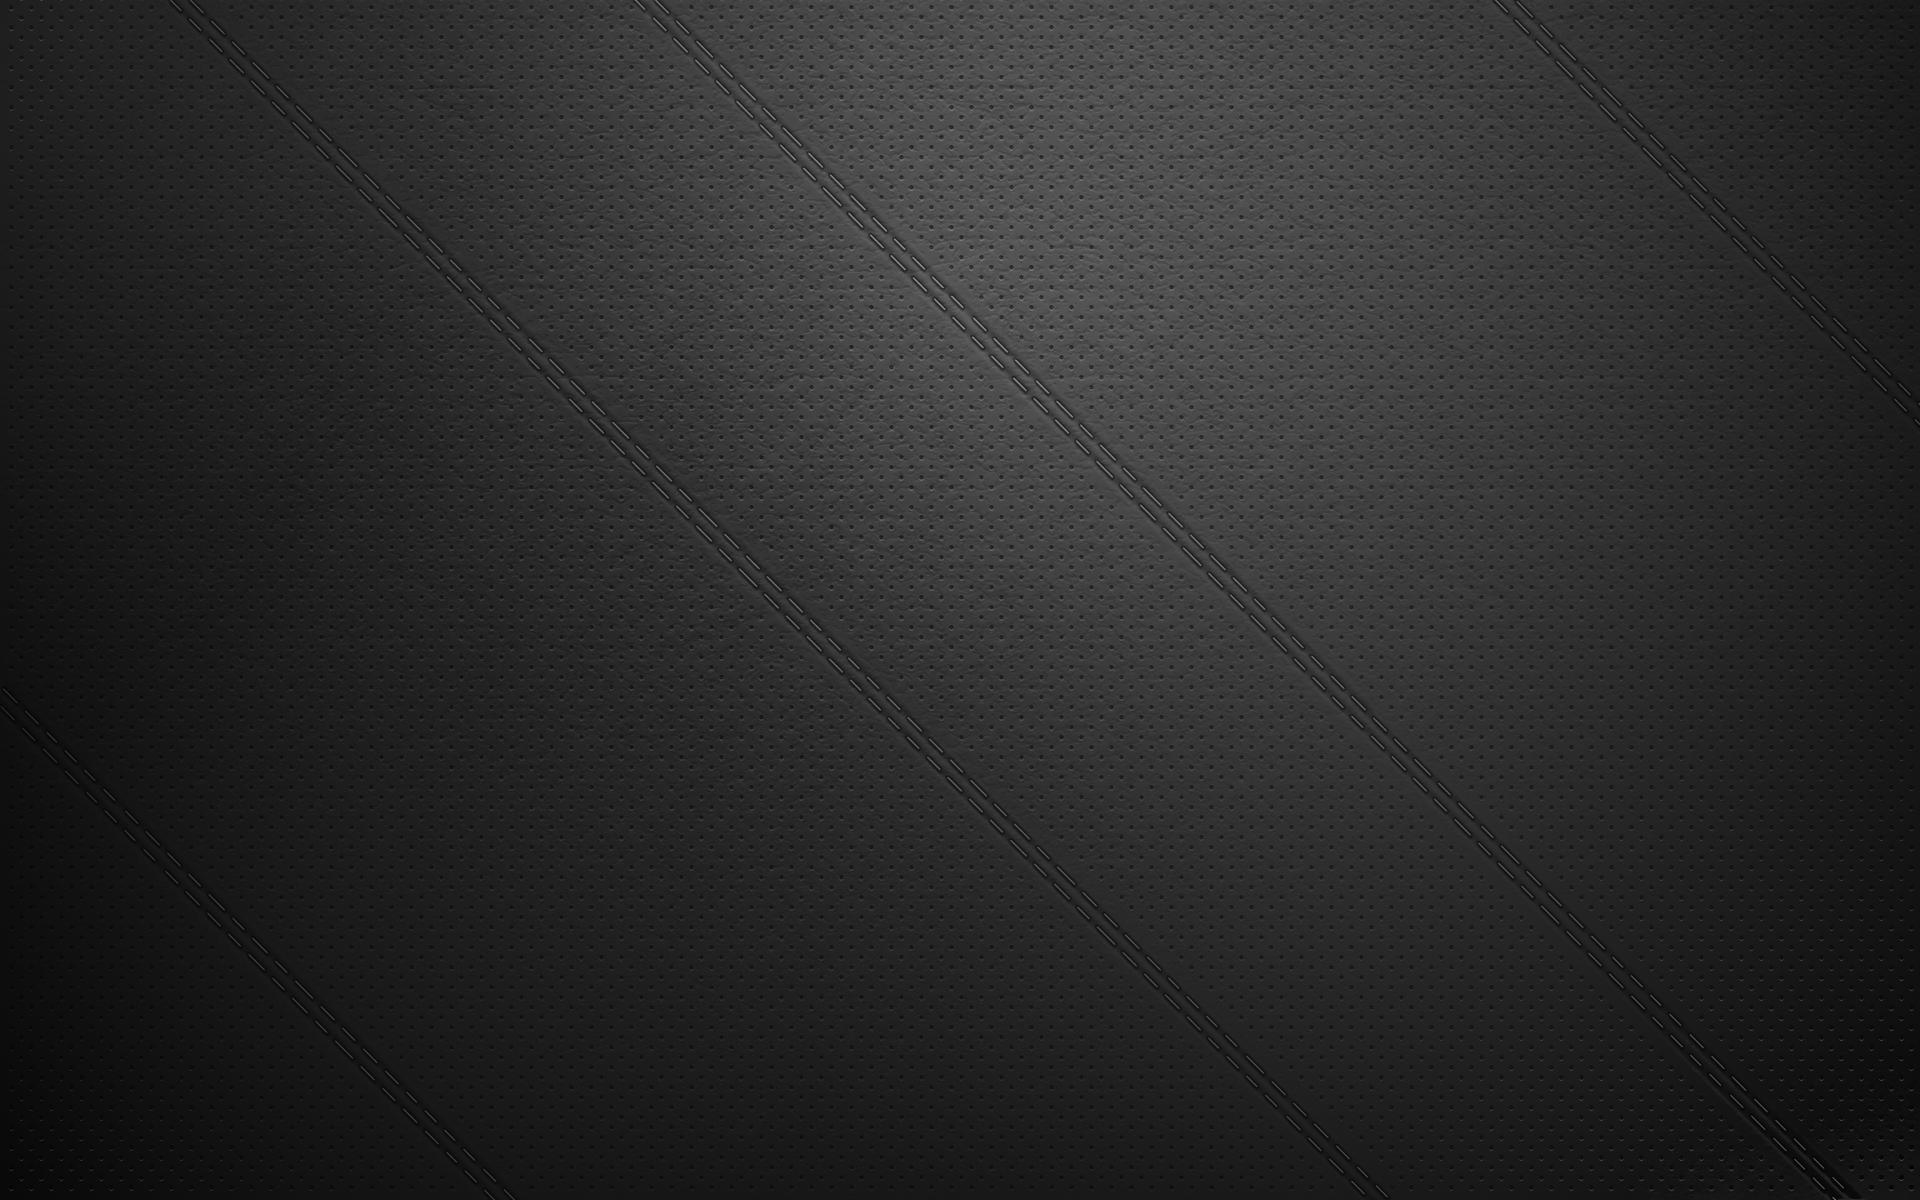 Cool Black Wall Black Background Wallpaper Plain Black Background Plain Black Wallpaper